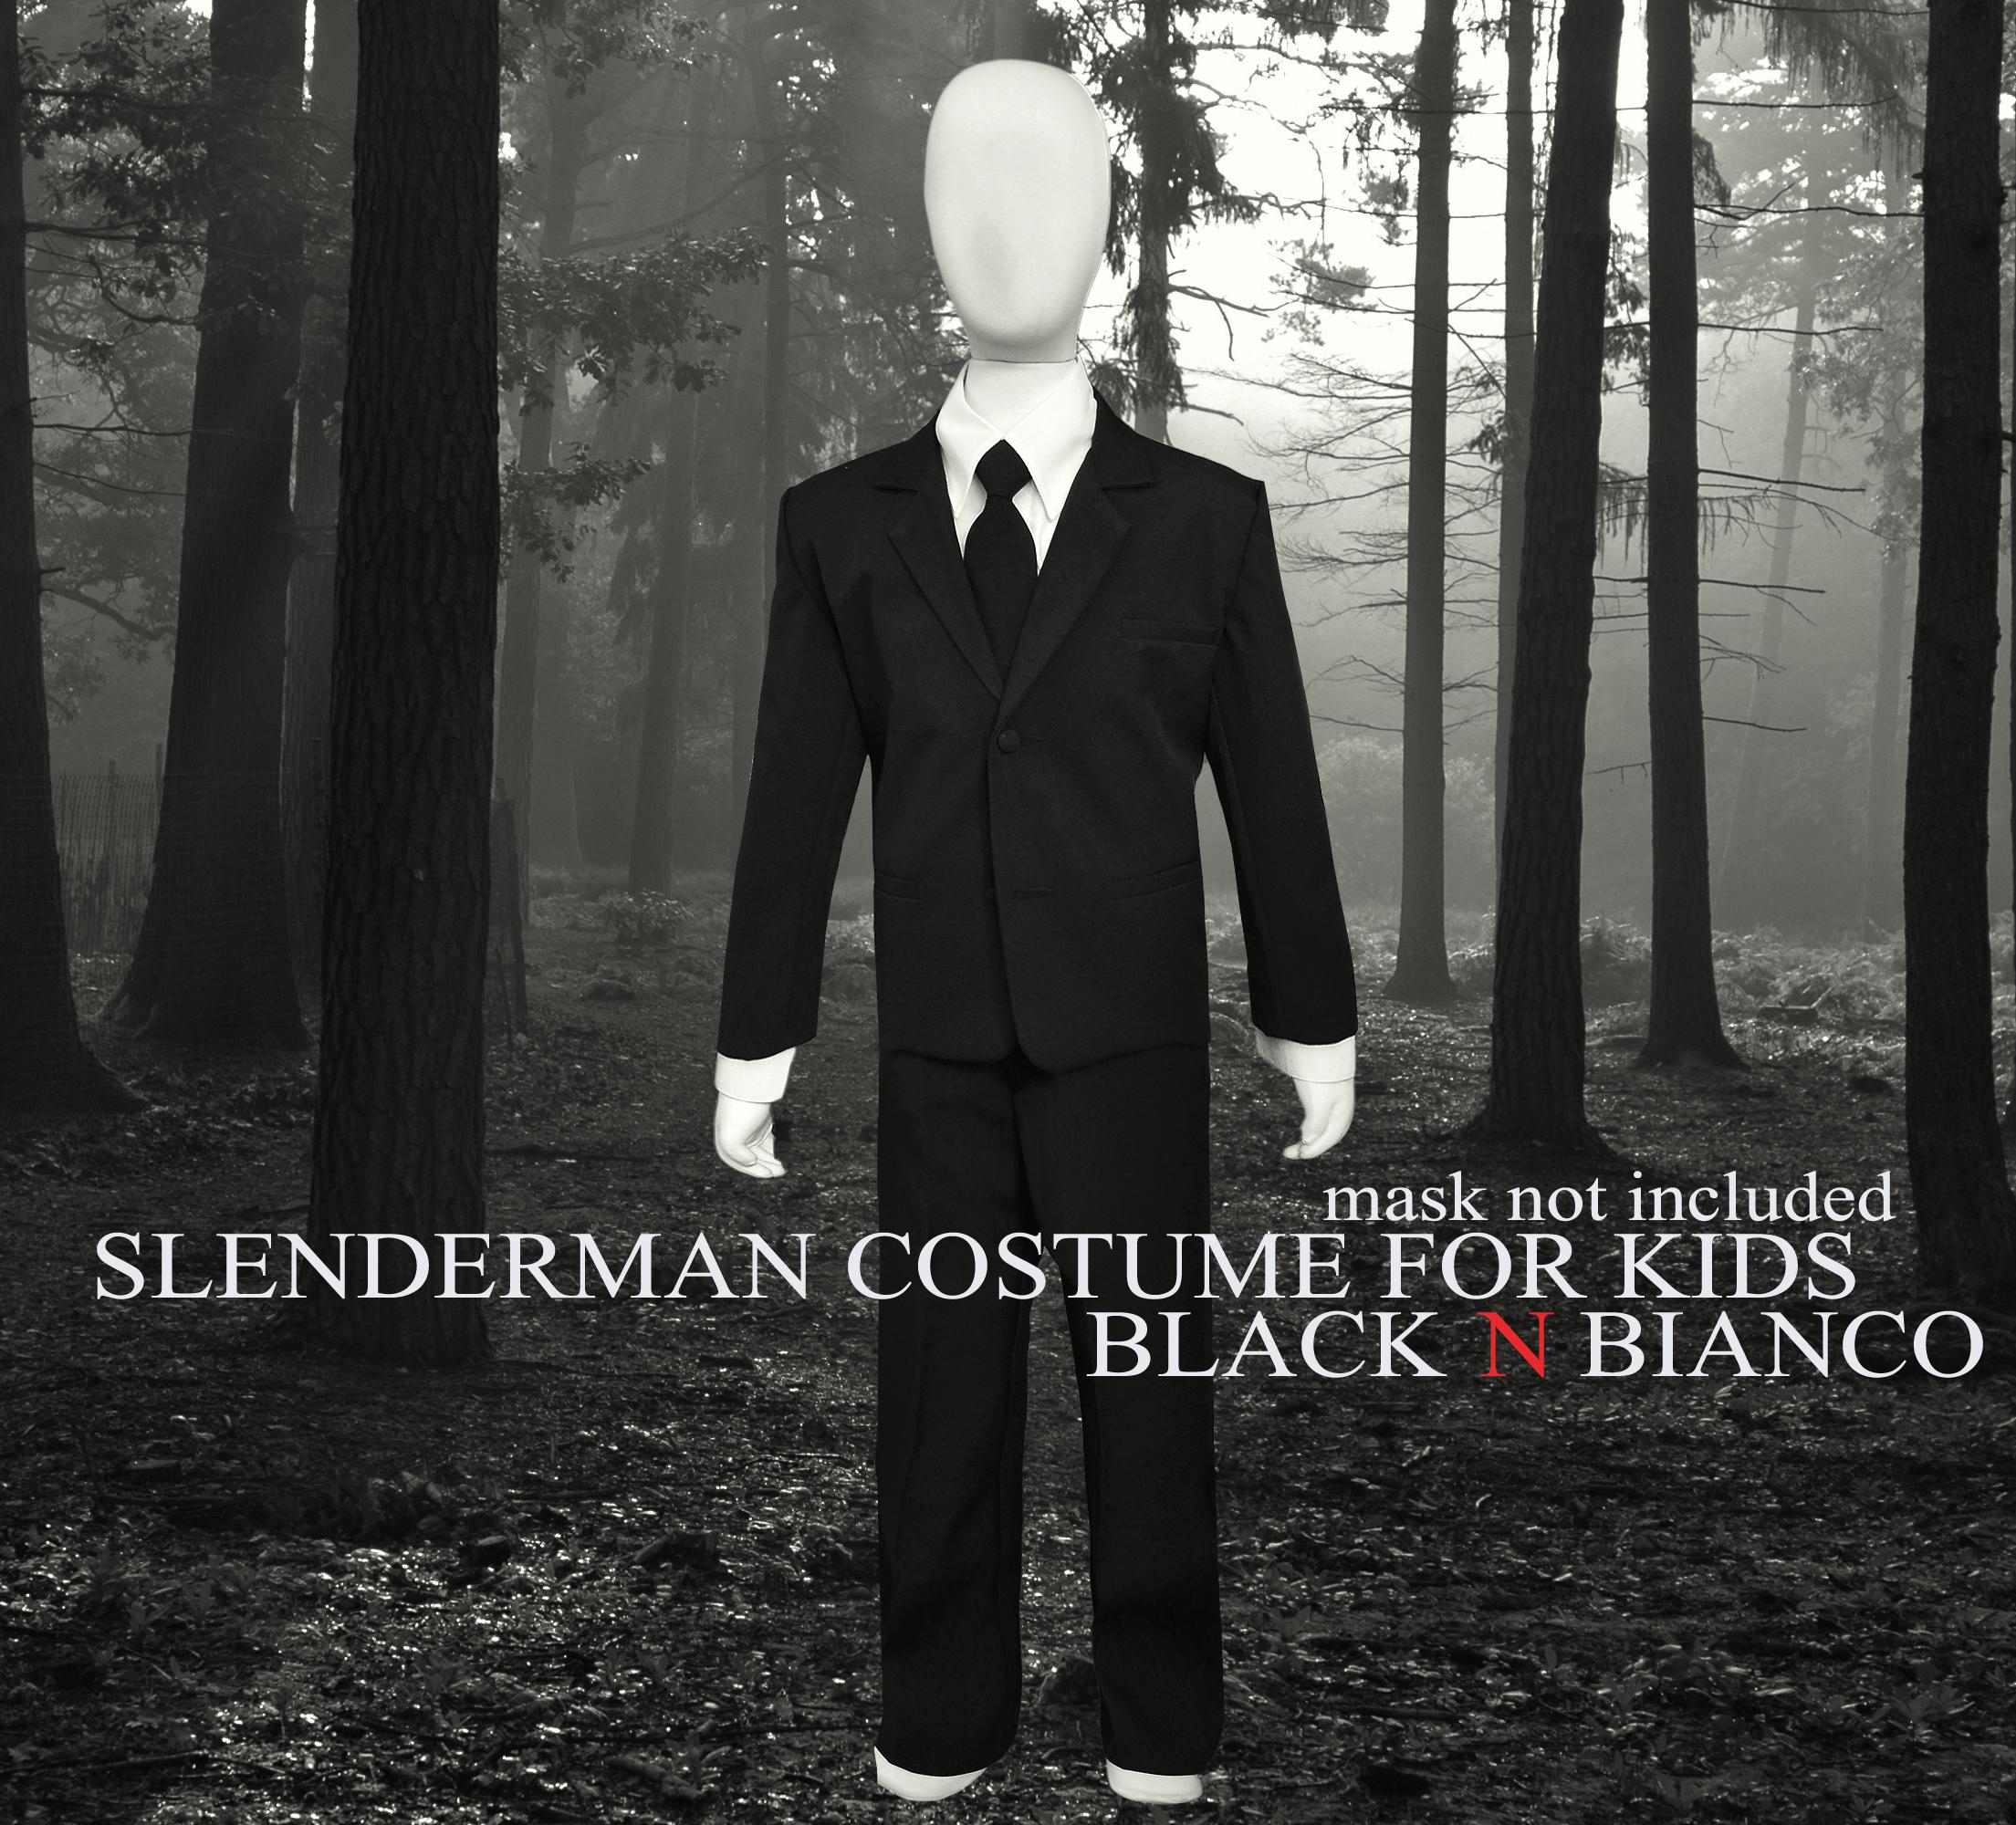 Slenderman Costume for Kids by Black N Bianco & BLACK N BIANCO Blog | Blogging about about the latest kids formal ...